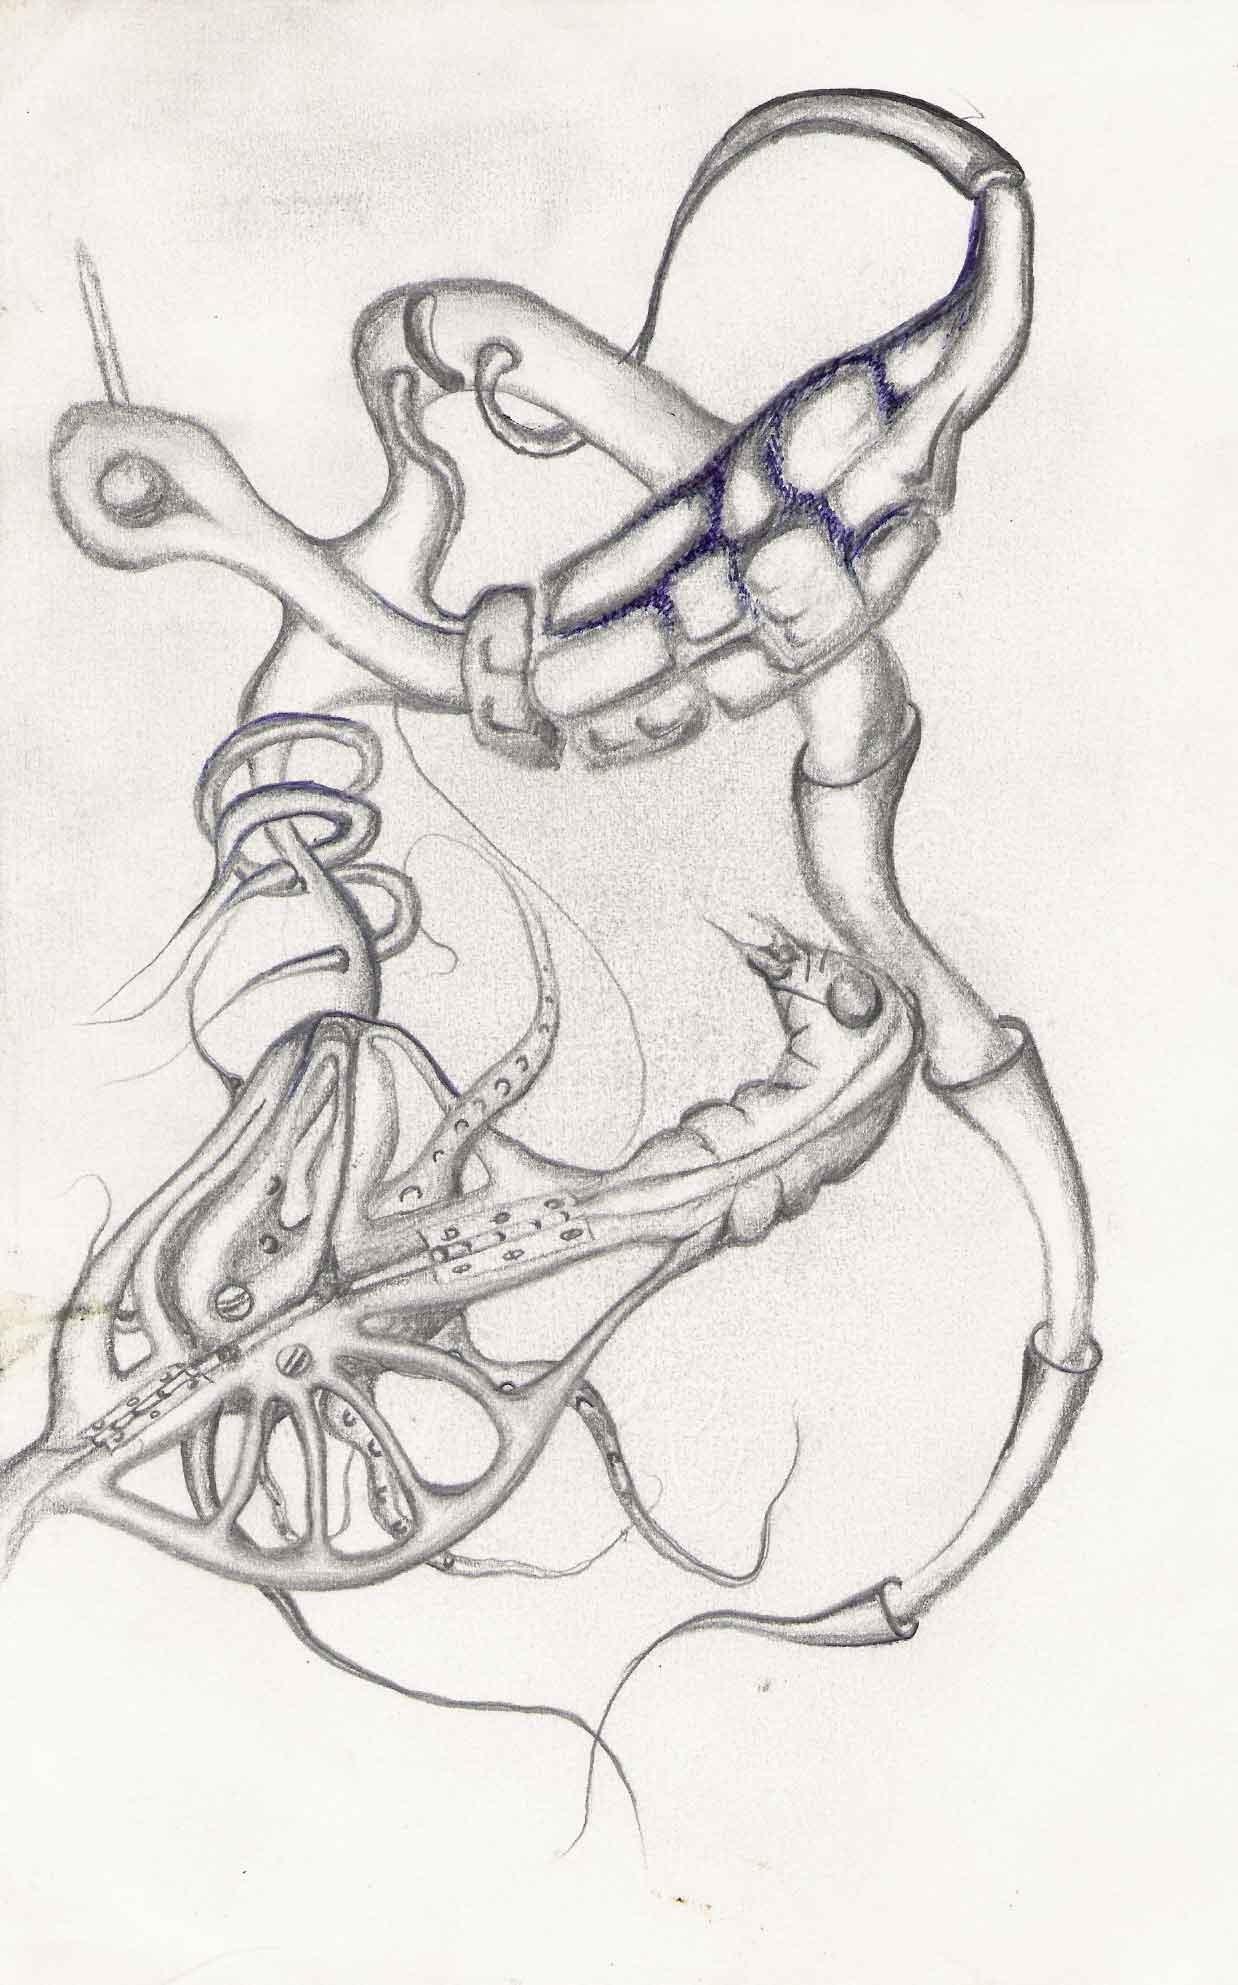 sketch-3-sept-05.jpg